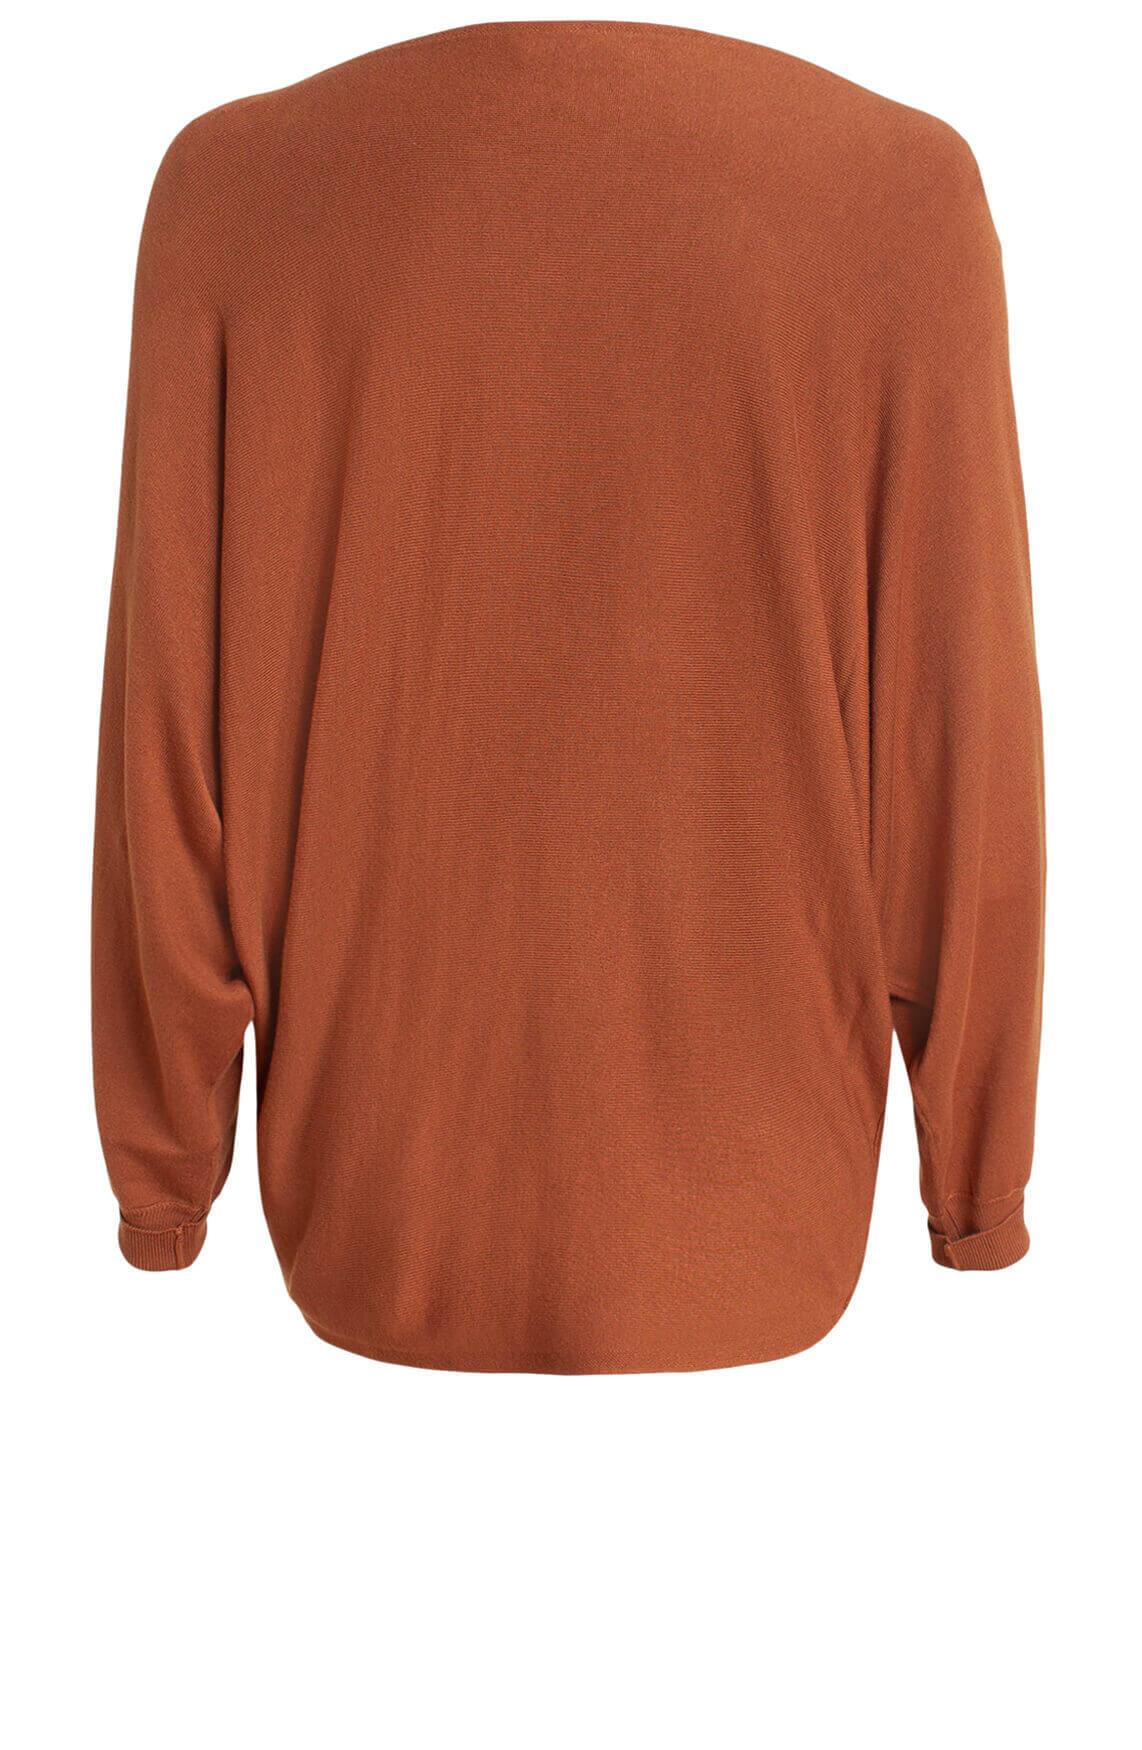 Anna Dames Oversized pullover Bruin